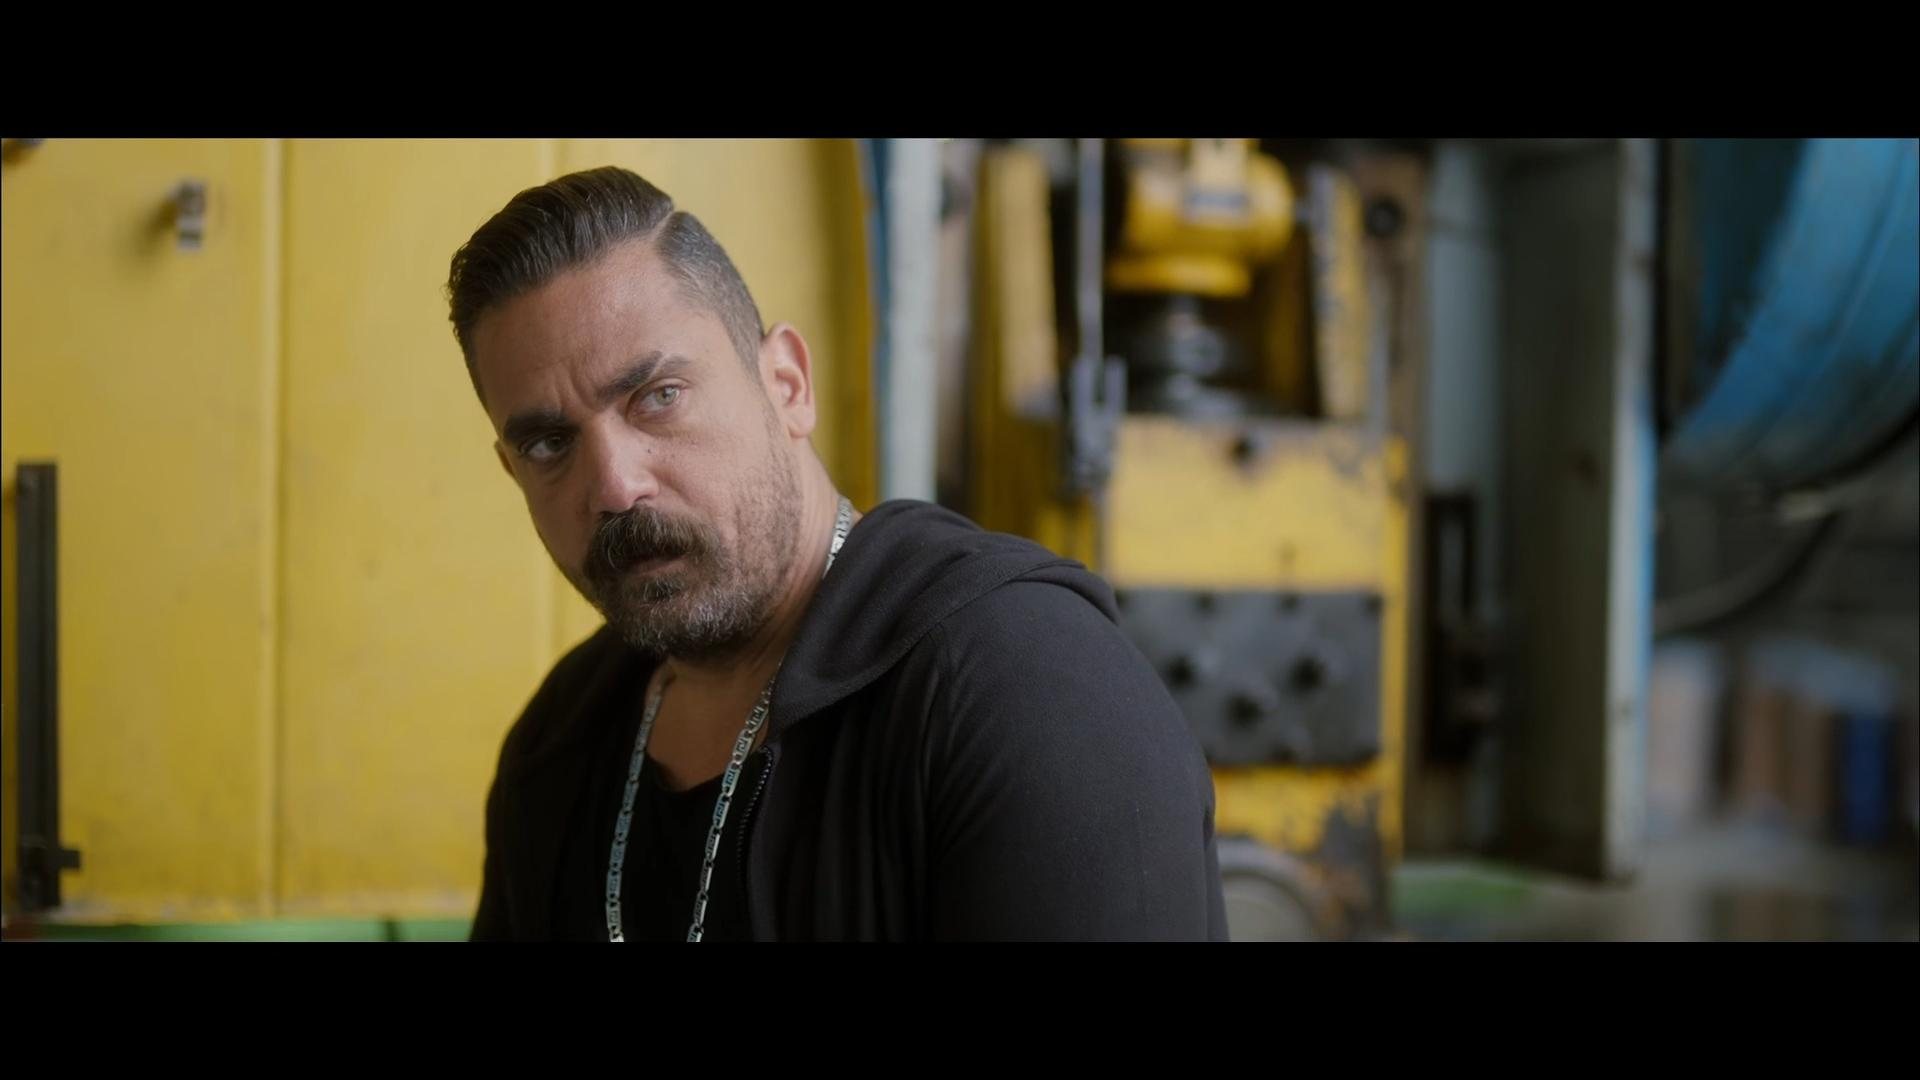 [فيلم][تورنت][تحميل][هروب اضطراري][2017][1080p][Web-DL] 13 arabp2p.com